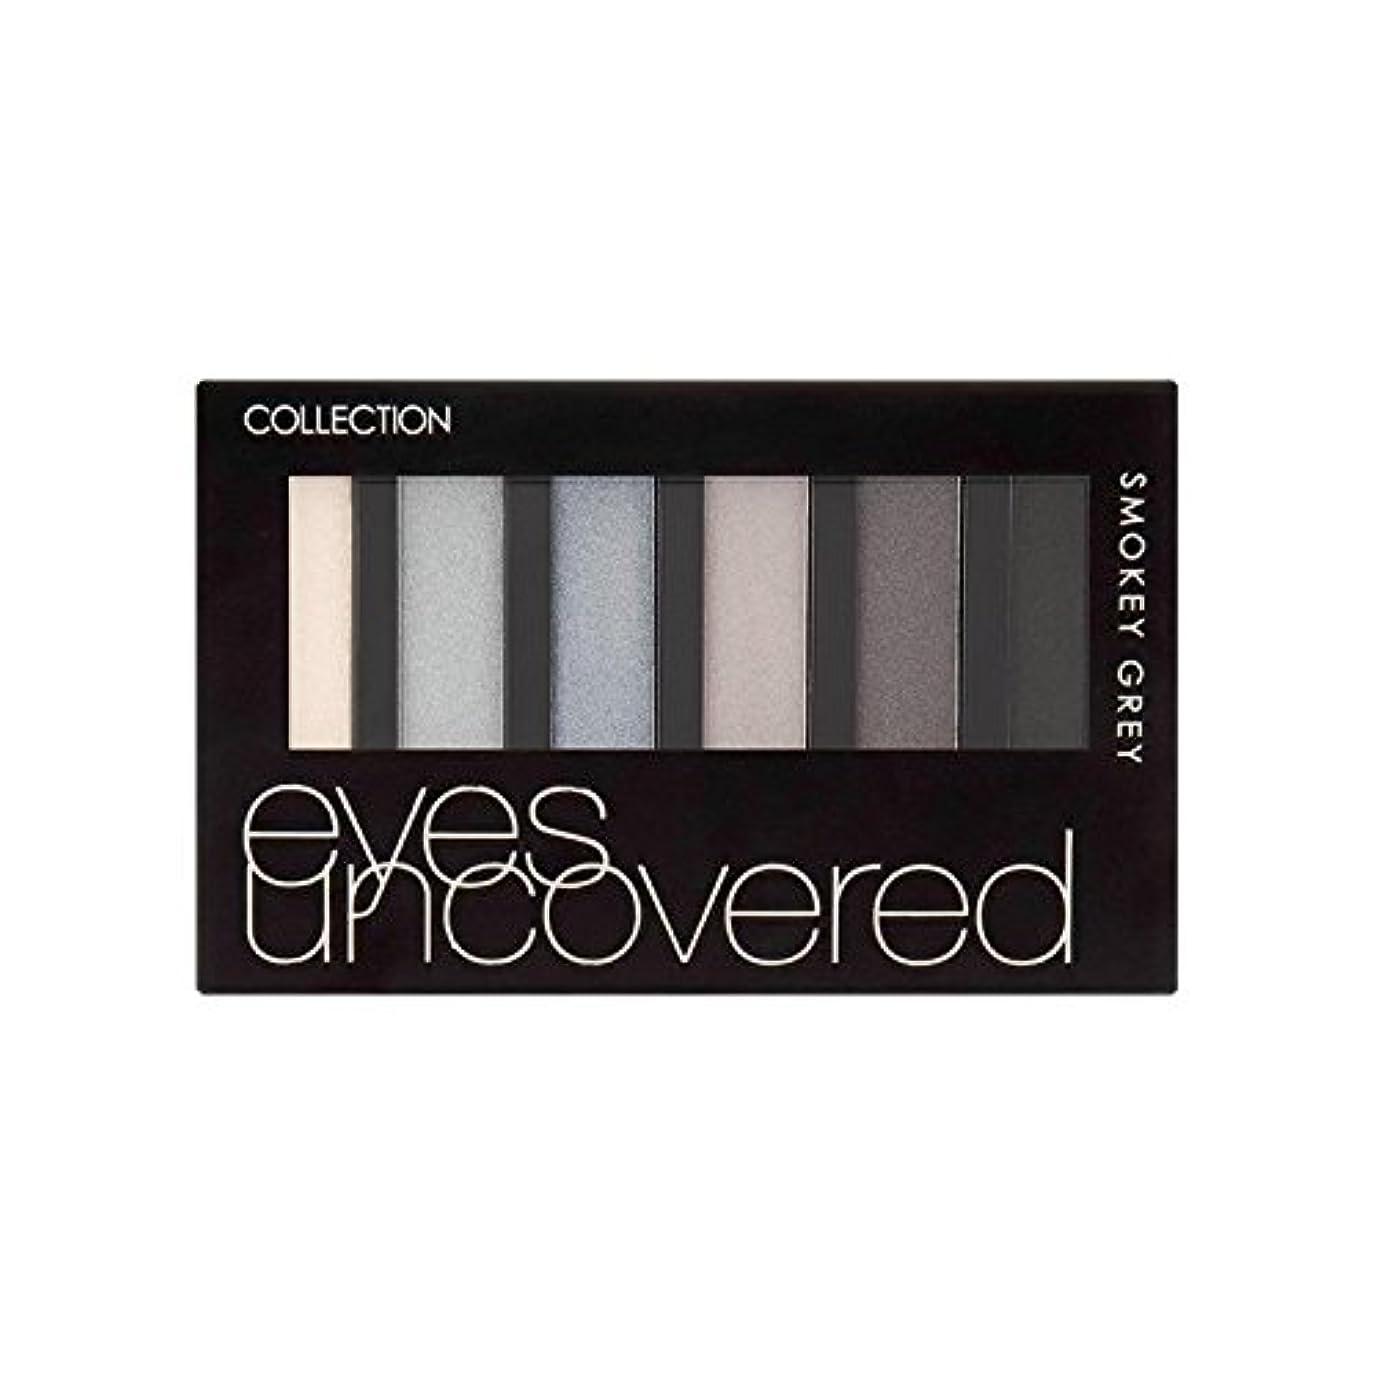 Collection Eyes Uncovered Palette Smokey Grey 6G - コレクションの目はパレットスモーキーグレー6グラムを発見します [並行輸入品]